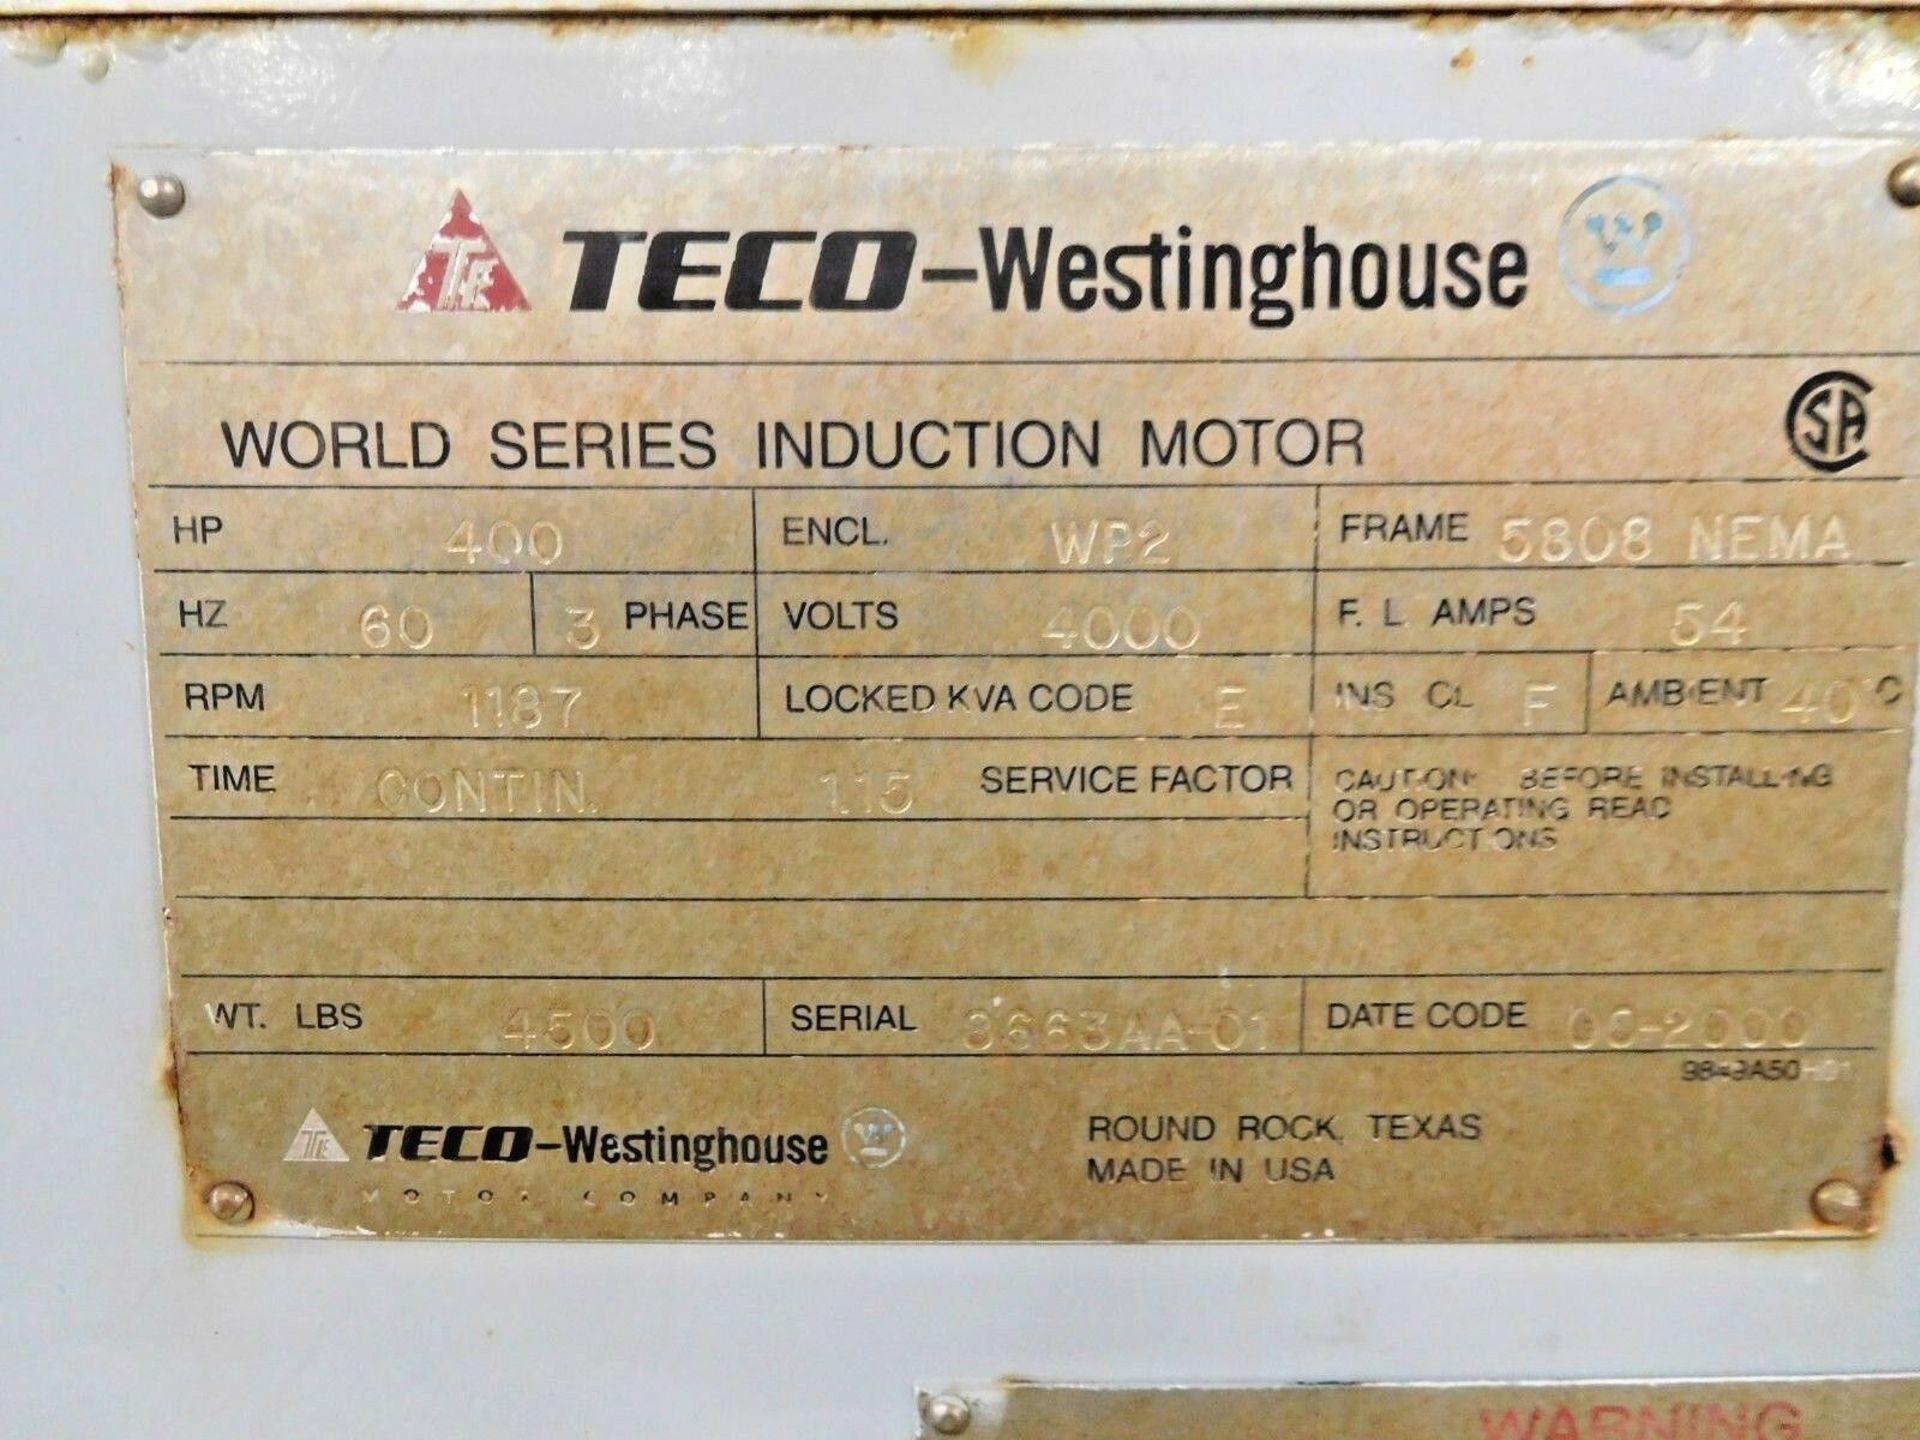 Westinghouse TECO 400 HP World Series Motor. 4000 V. 1187 RPM. 5808. WP2. 3 Ph. 60 Hz. - Image 4 of 4